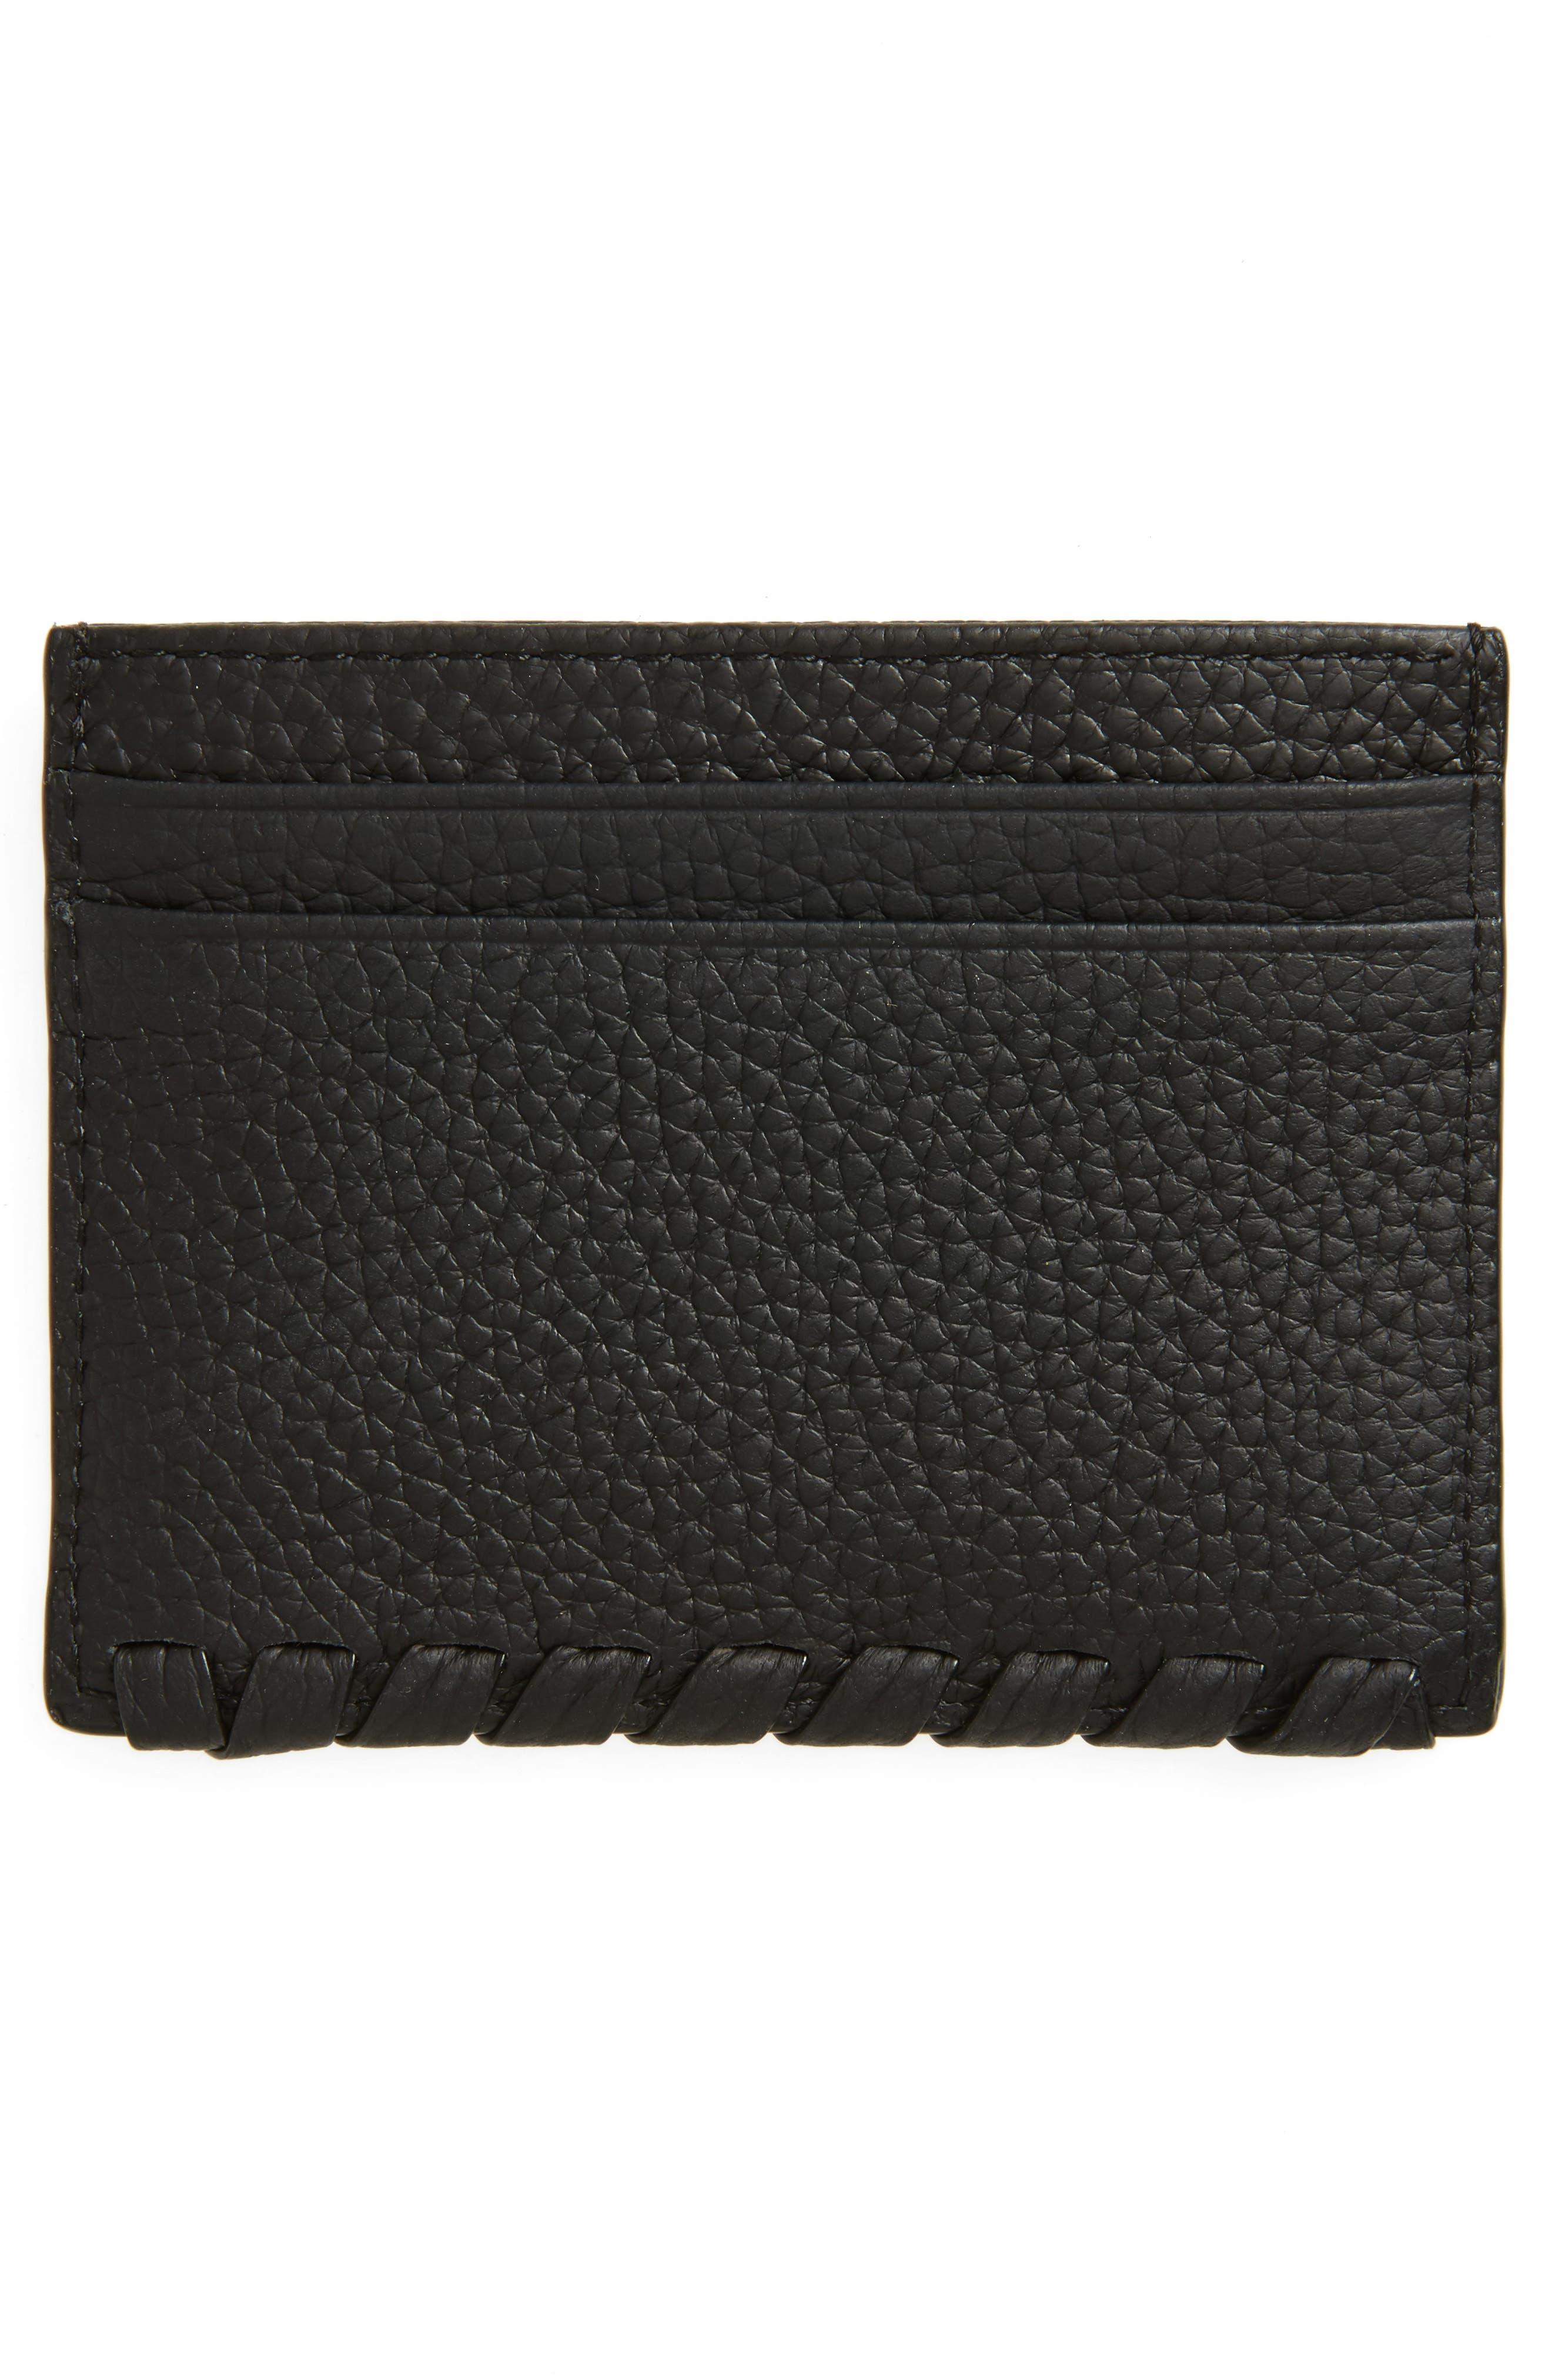 Kita Pebbled Leather Card Case,                             Alternate thumbnail 2, color,                             001